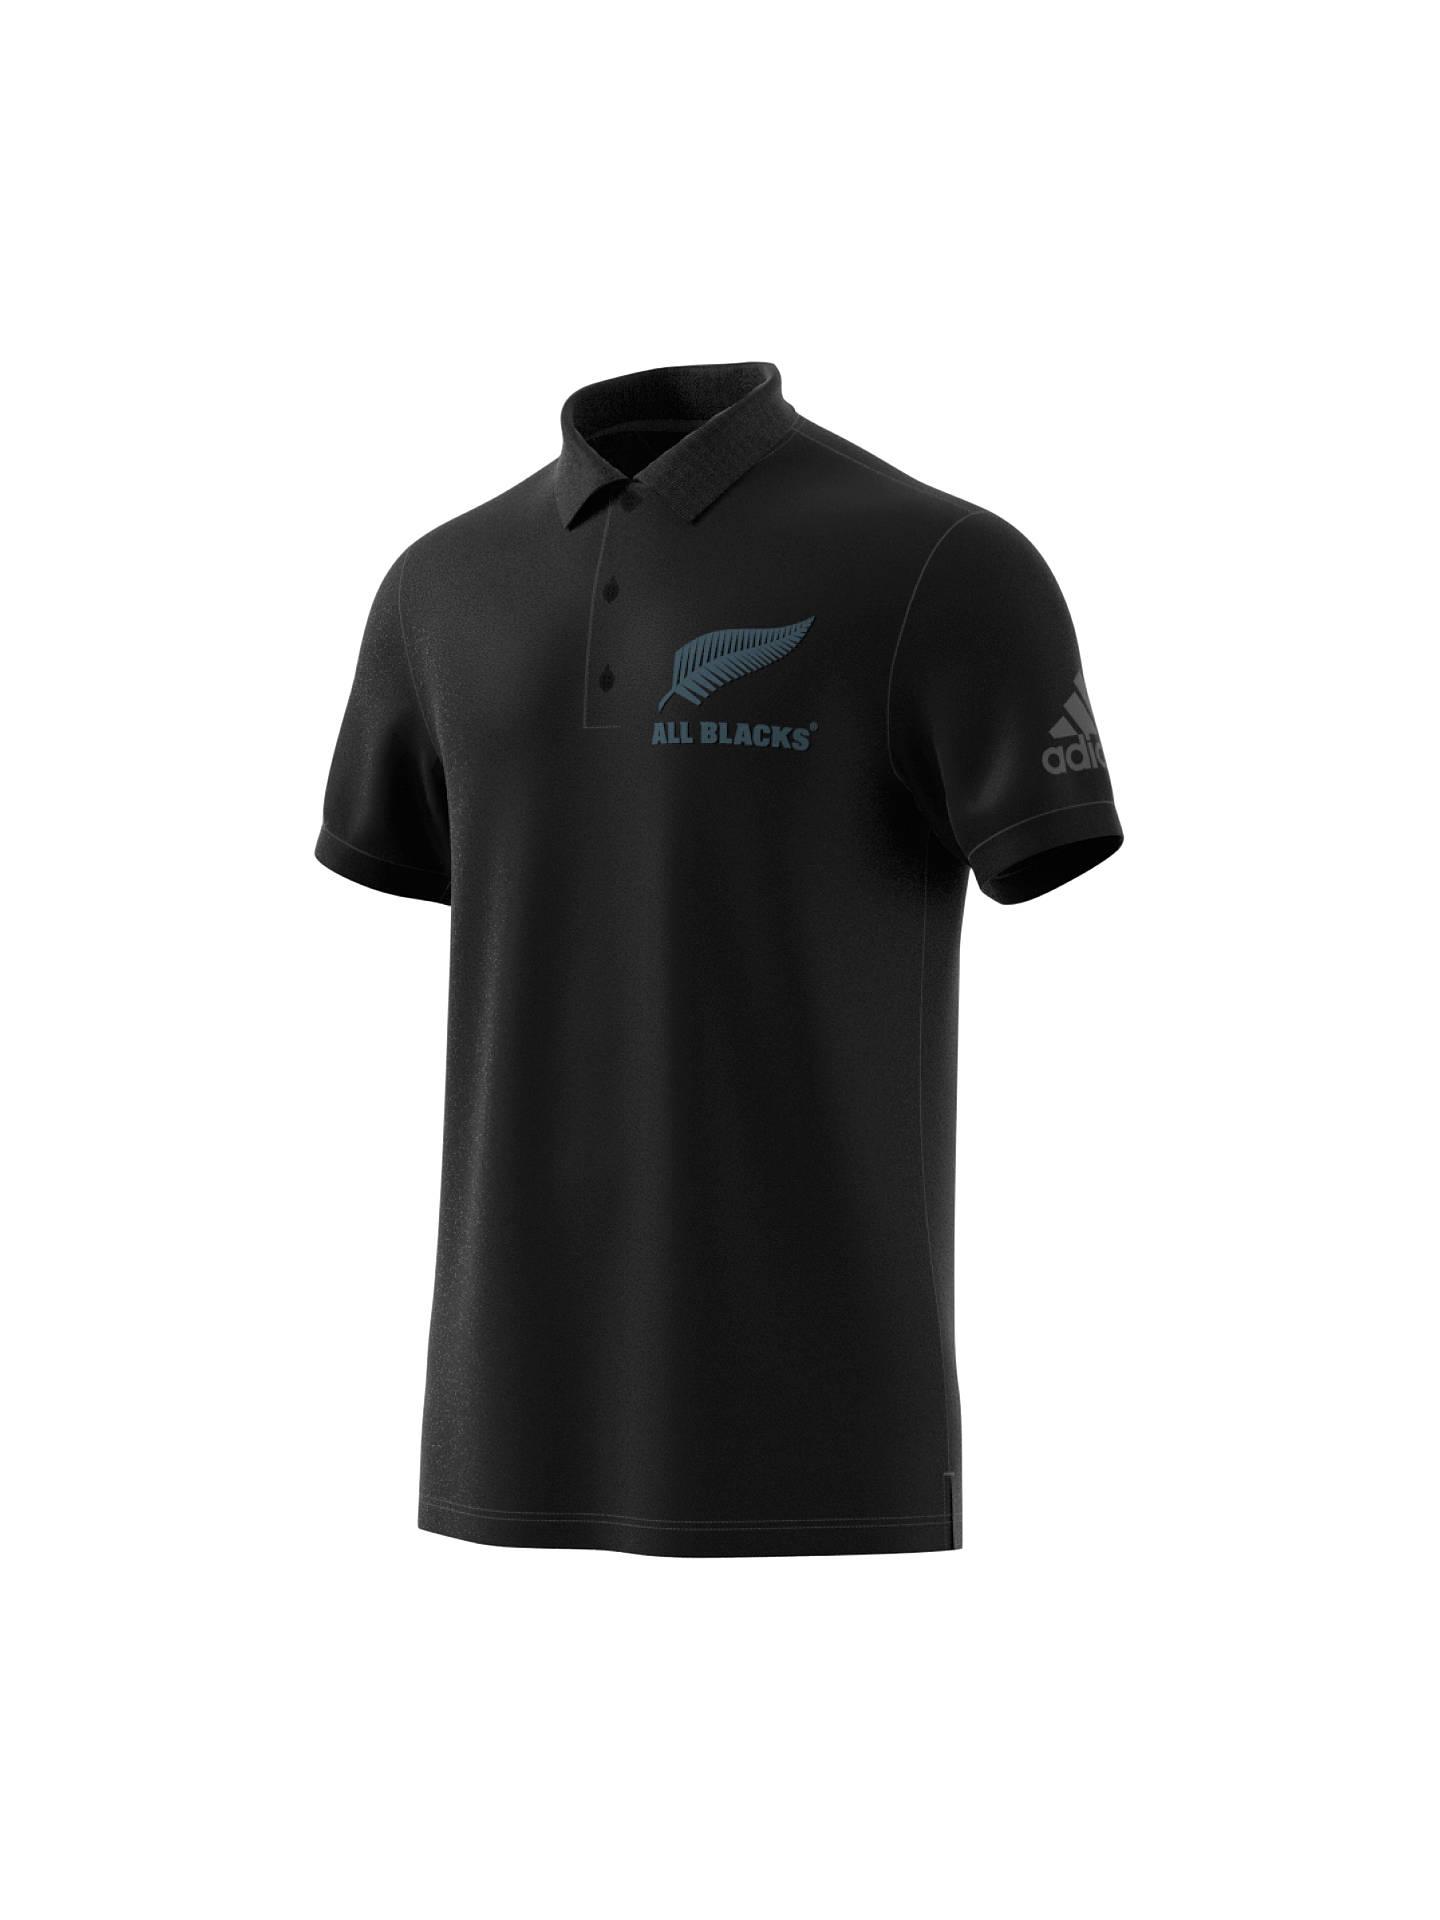 3b74c81a0b5 Buy Adidas New Zealand All Blacks 16th Man Rugby Polo Shirt